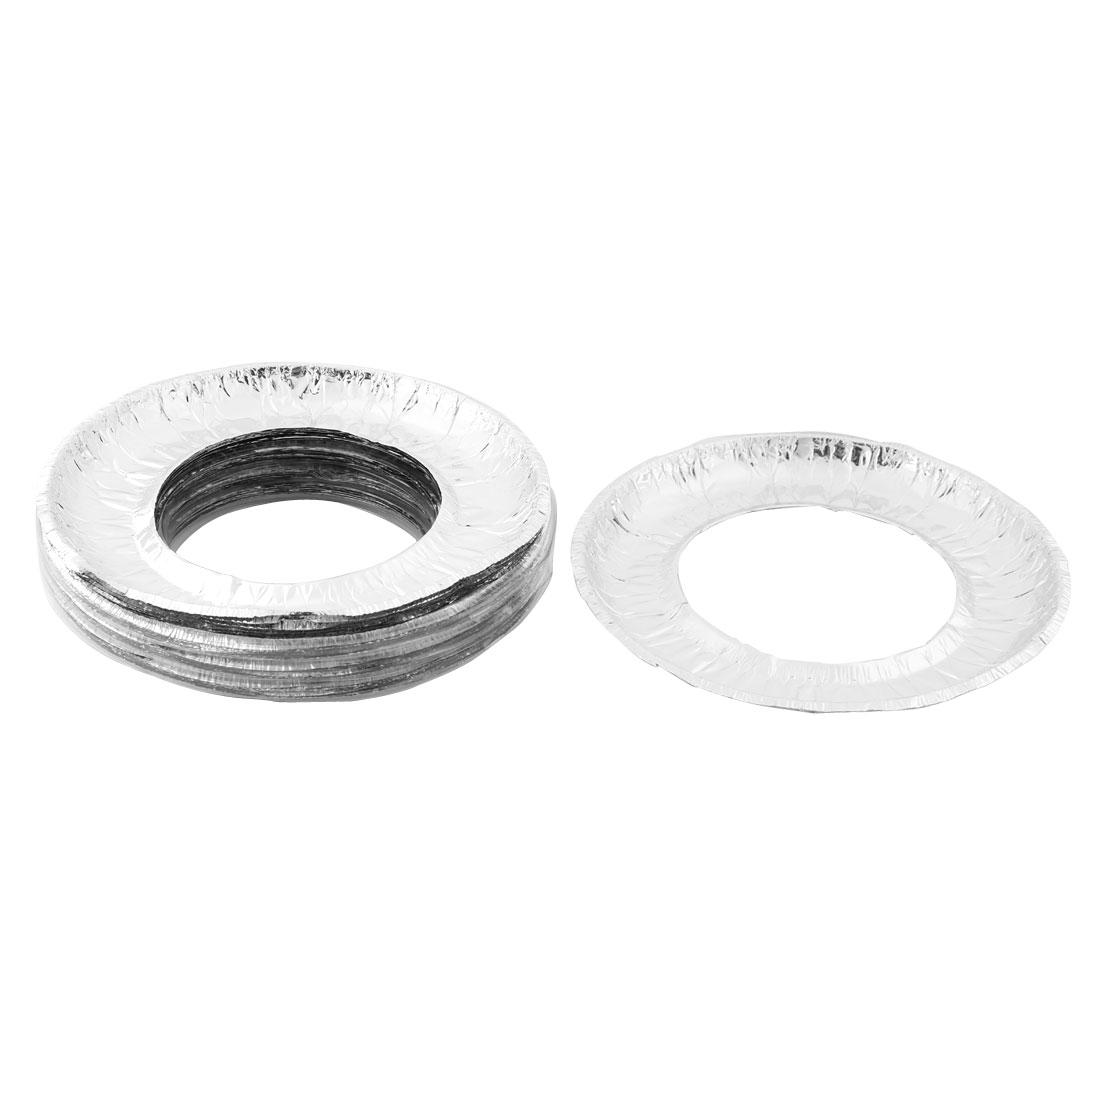 Cookware Aluminum Foil Round Shaped Stove Burner Clean Bib Liners Covers 40 PCS